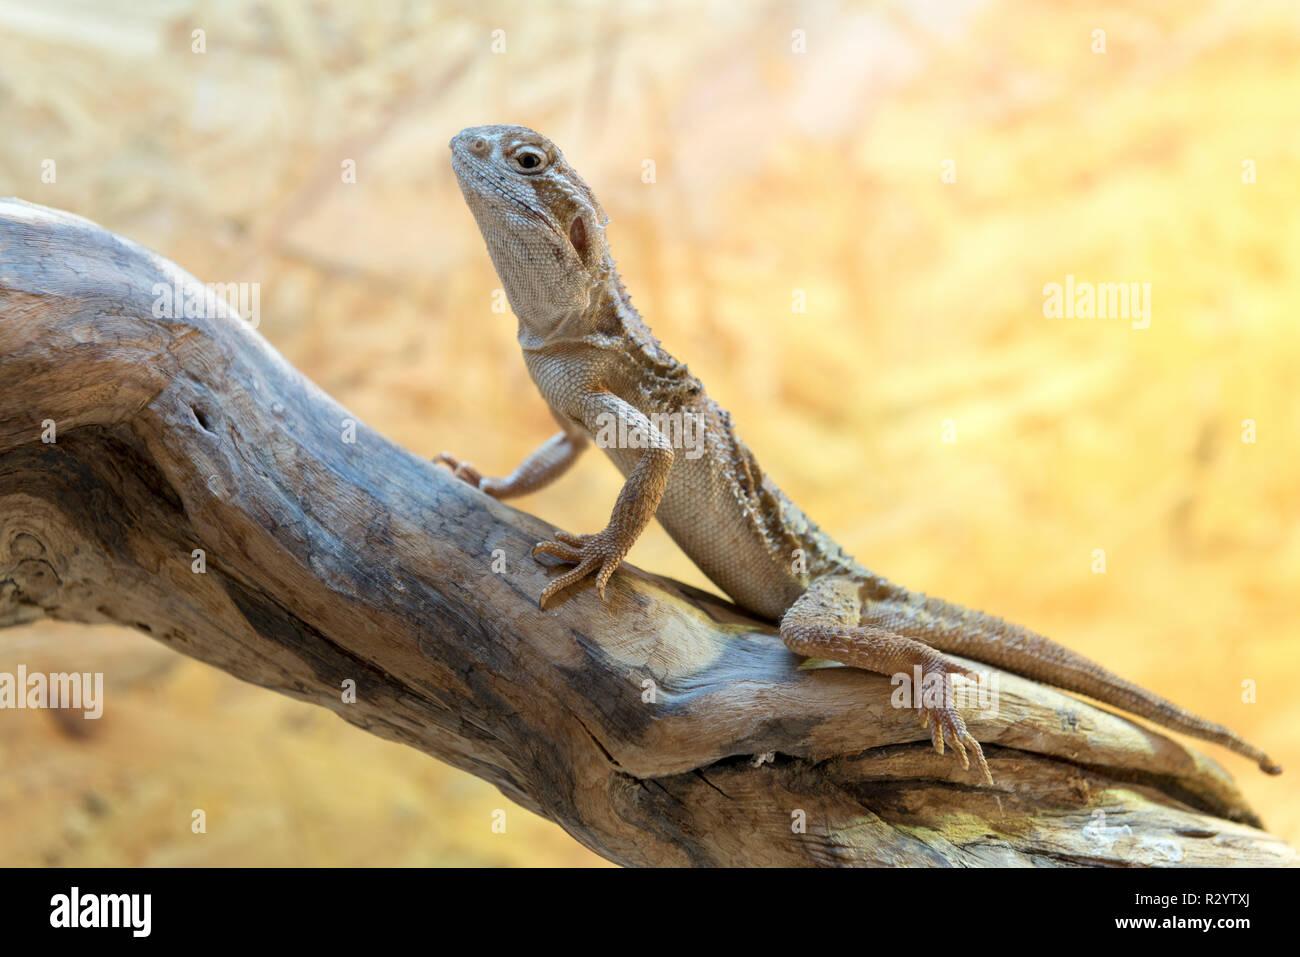 Rankin's dragon (Pogona henrylawsoni) on a branch - Stock Image